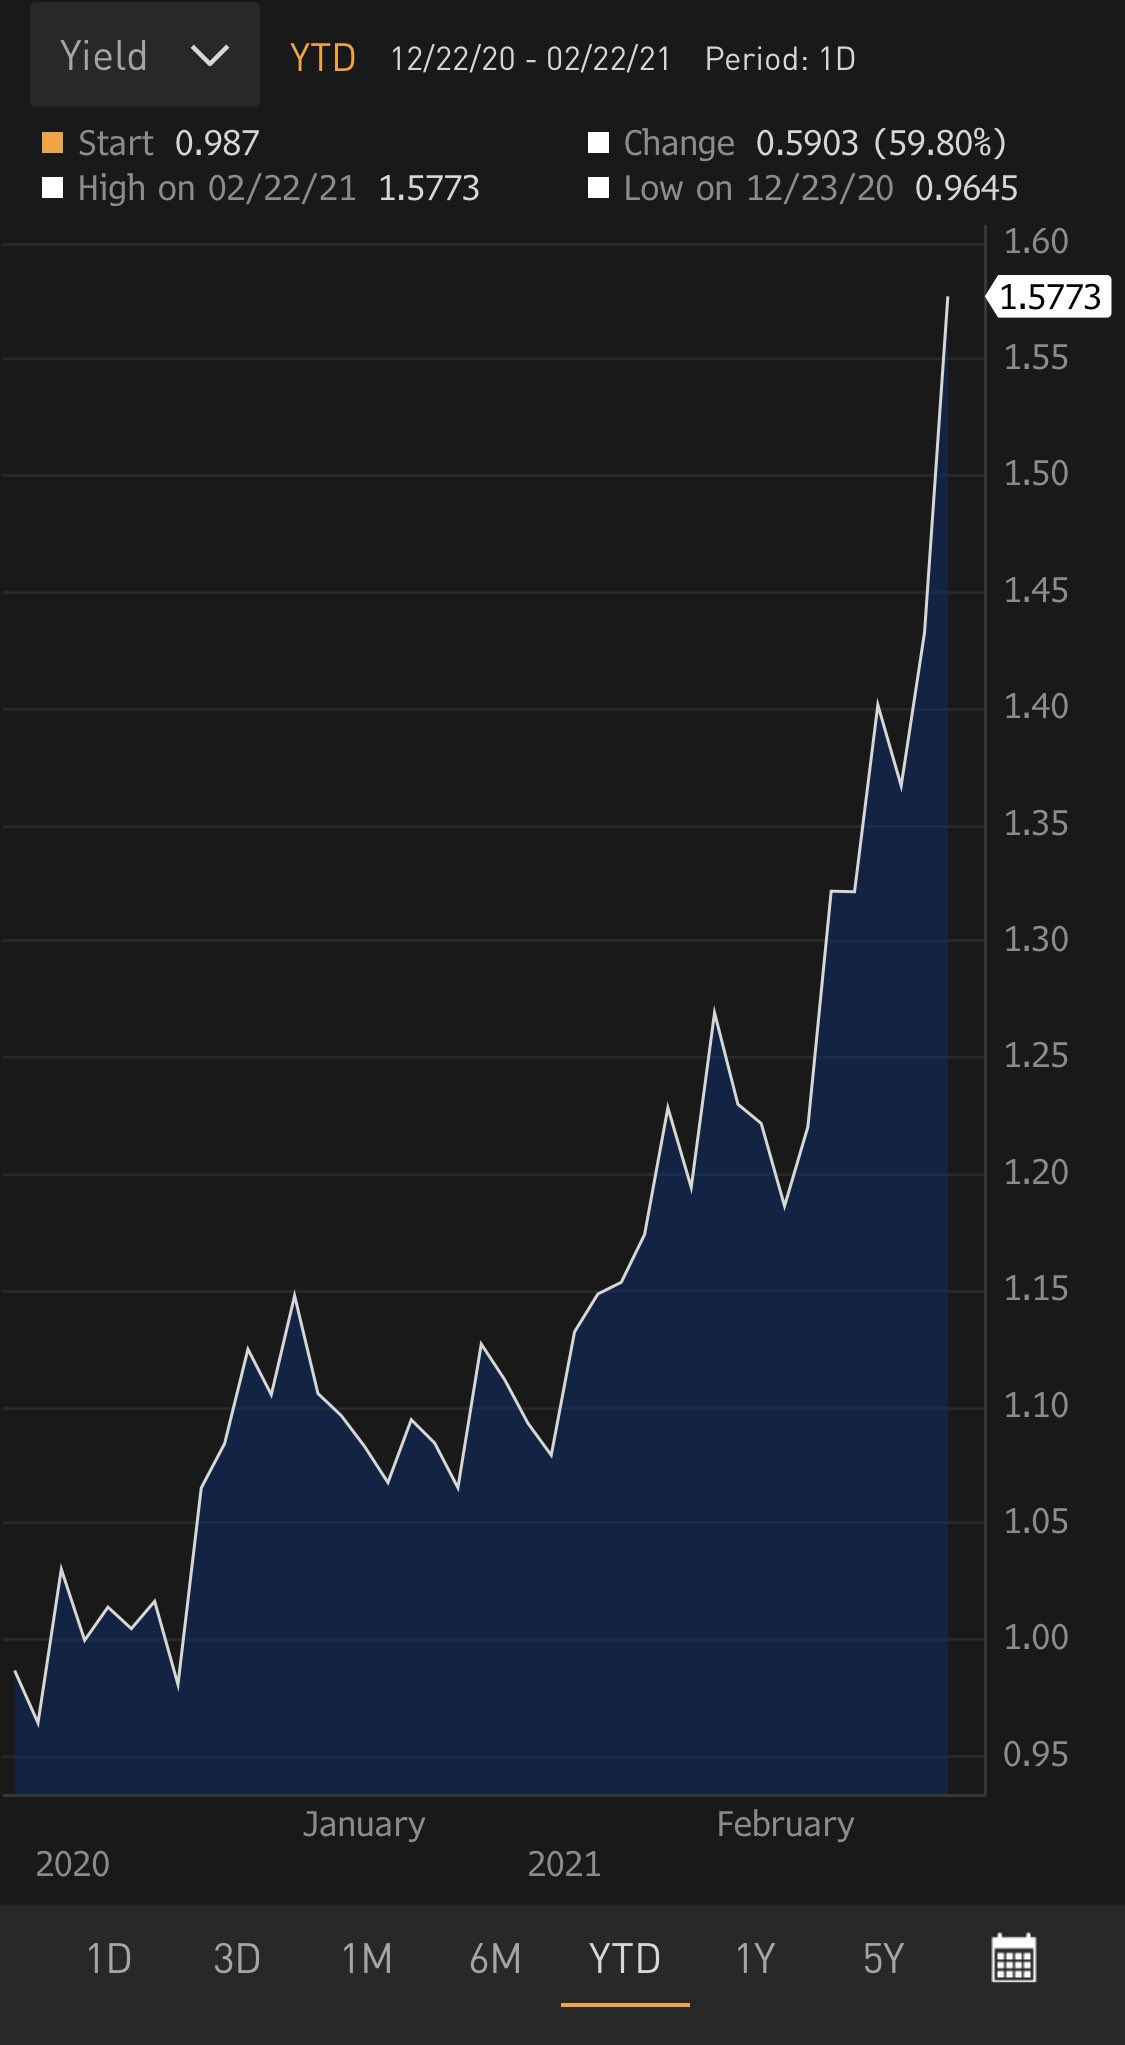 Rising bonds yields in Australia are rather impressive too